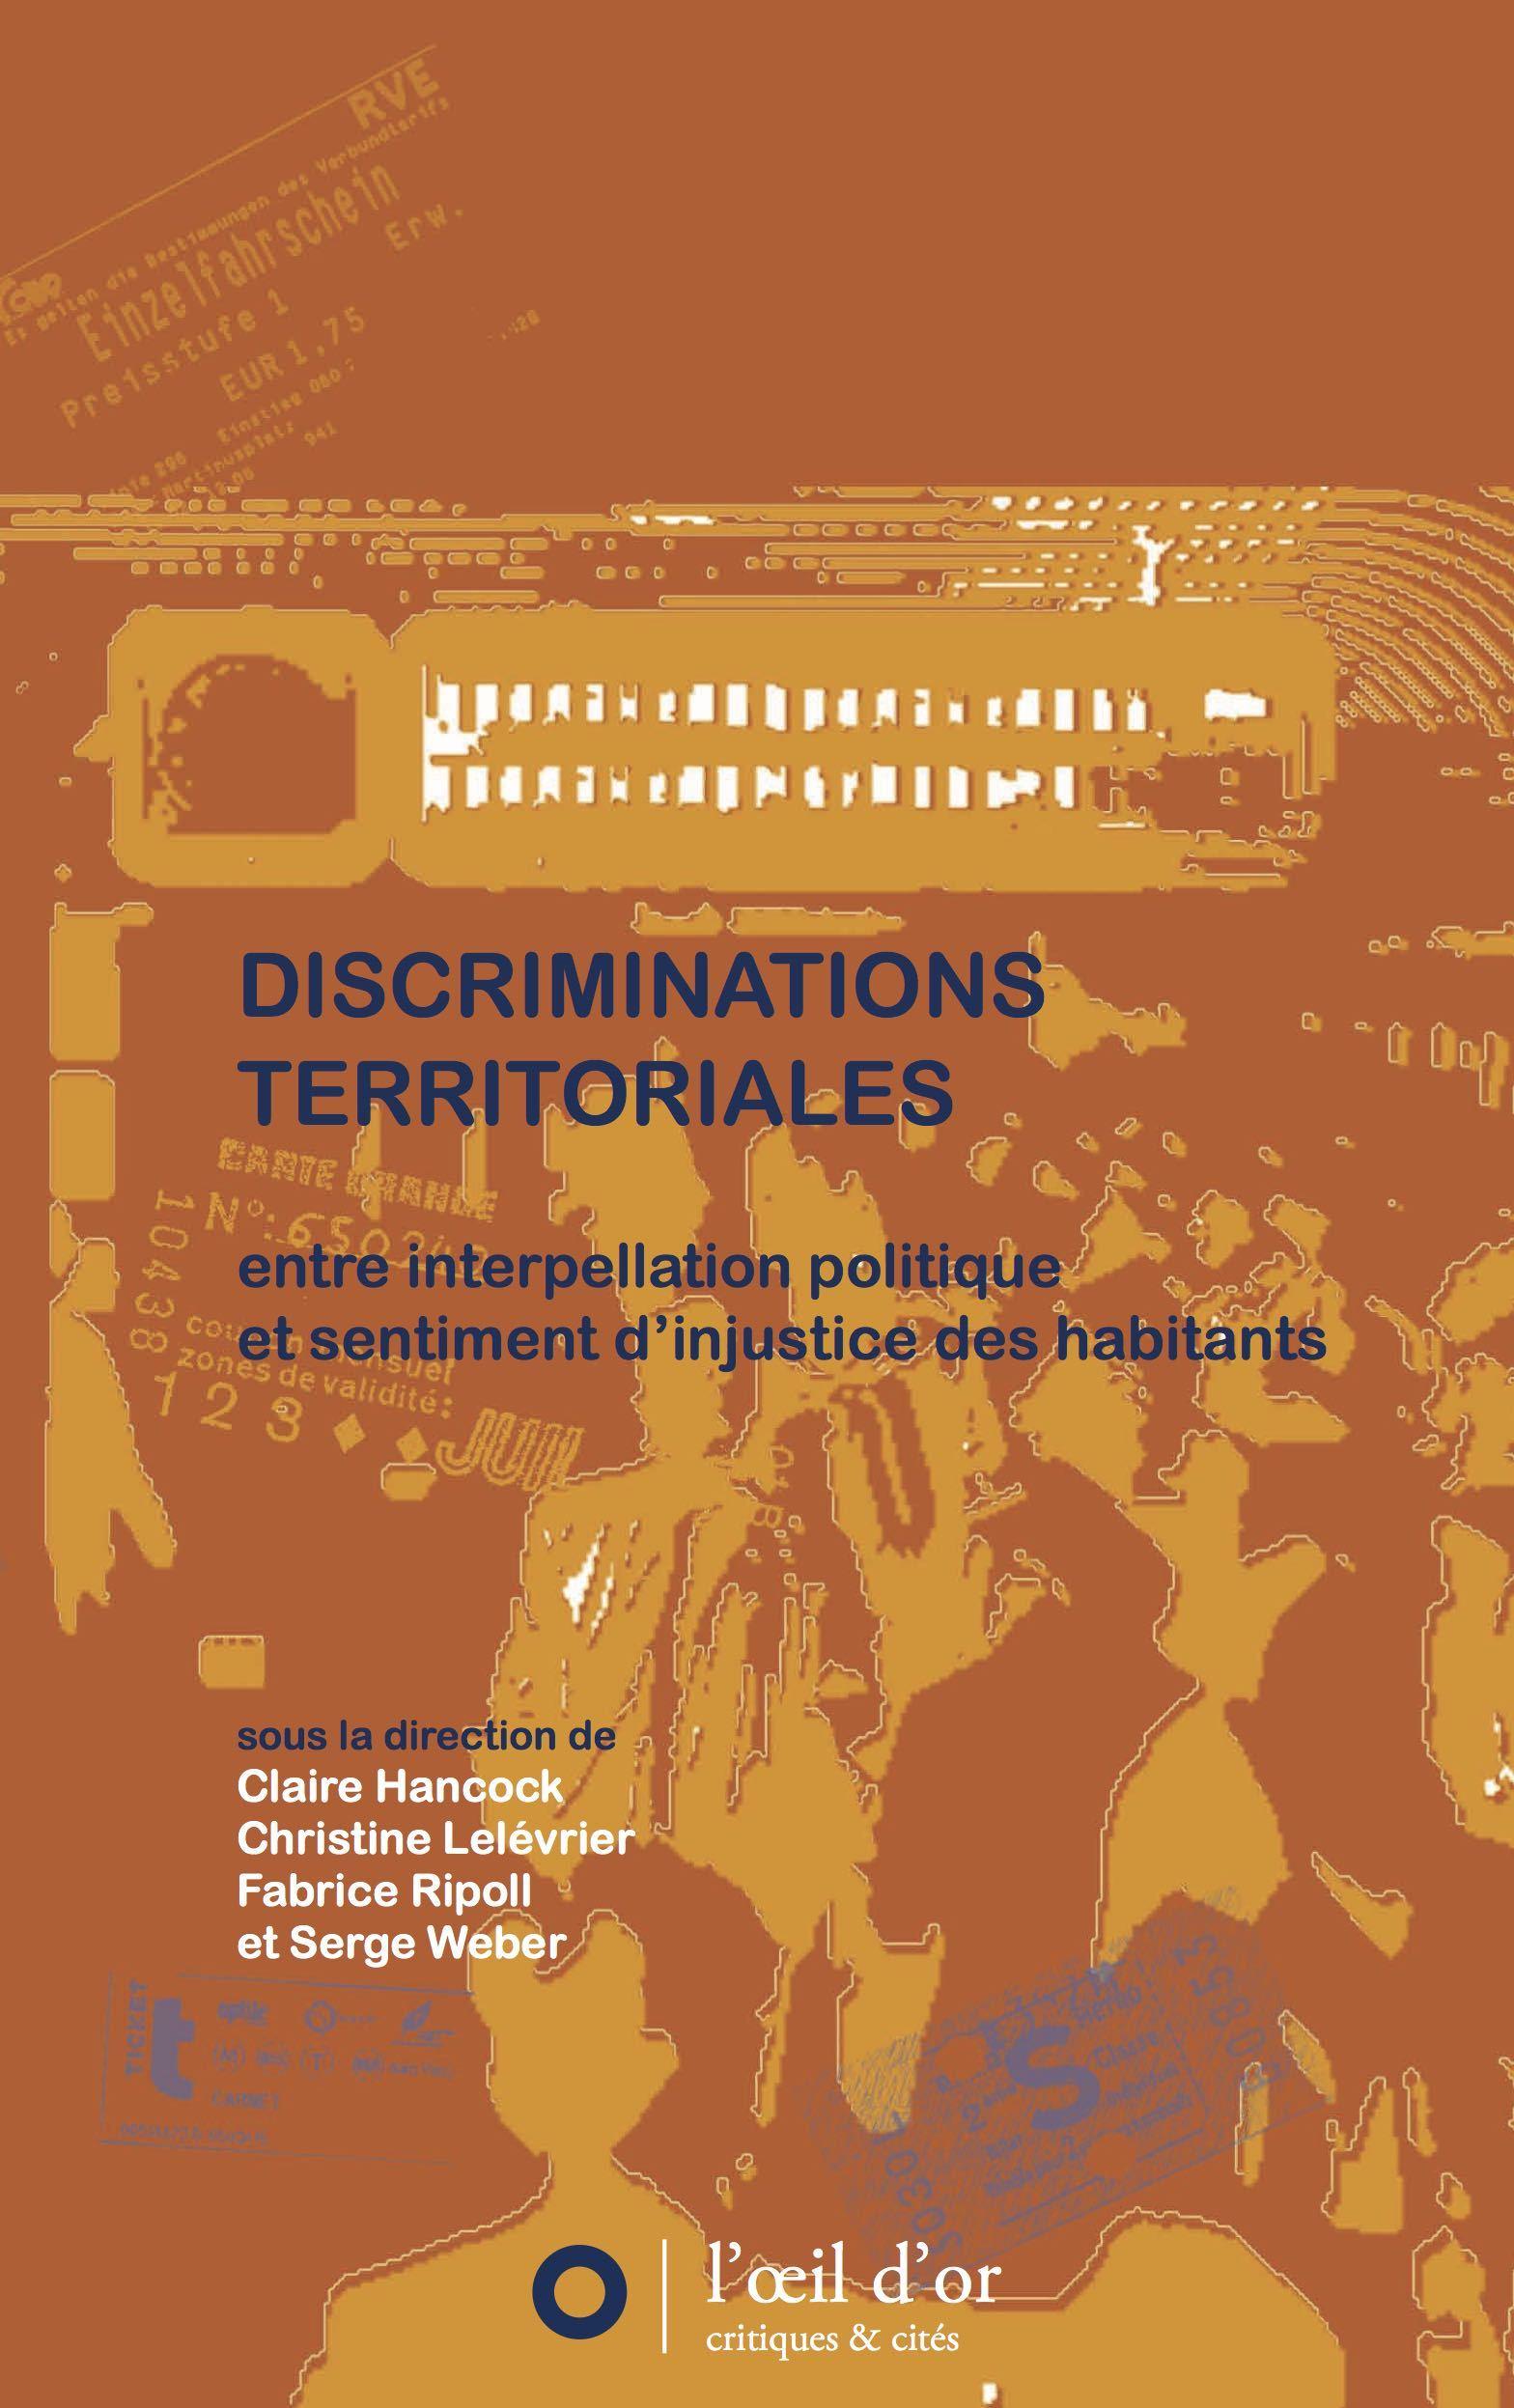 DISCRIMINATIONS TERRITORIALES, ENTRE INTERPELLATION POLITIQUE ET SENTIMENTS D'INJUSTICE DES HABITANT